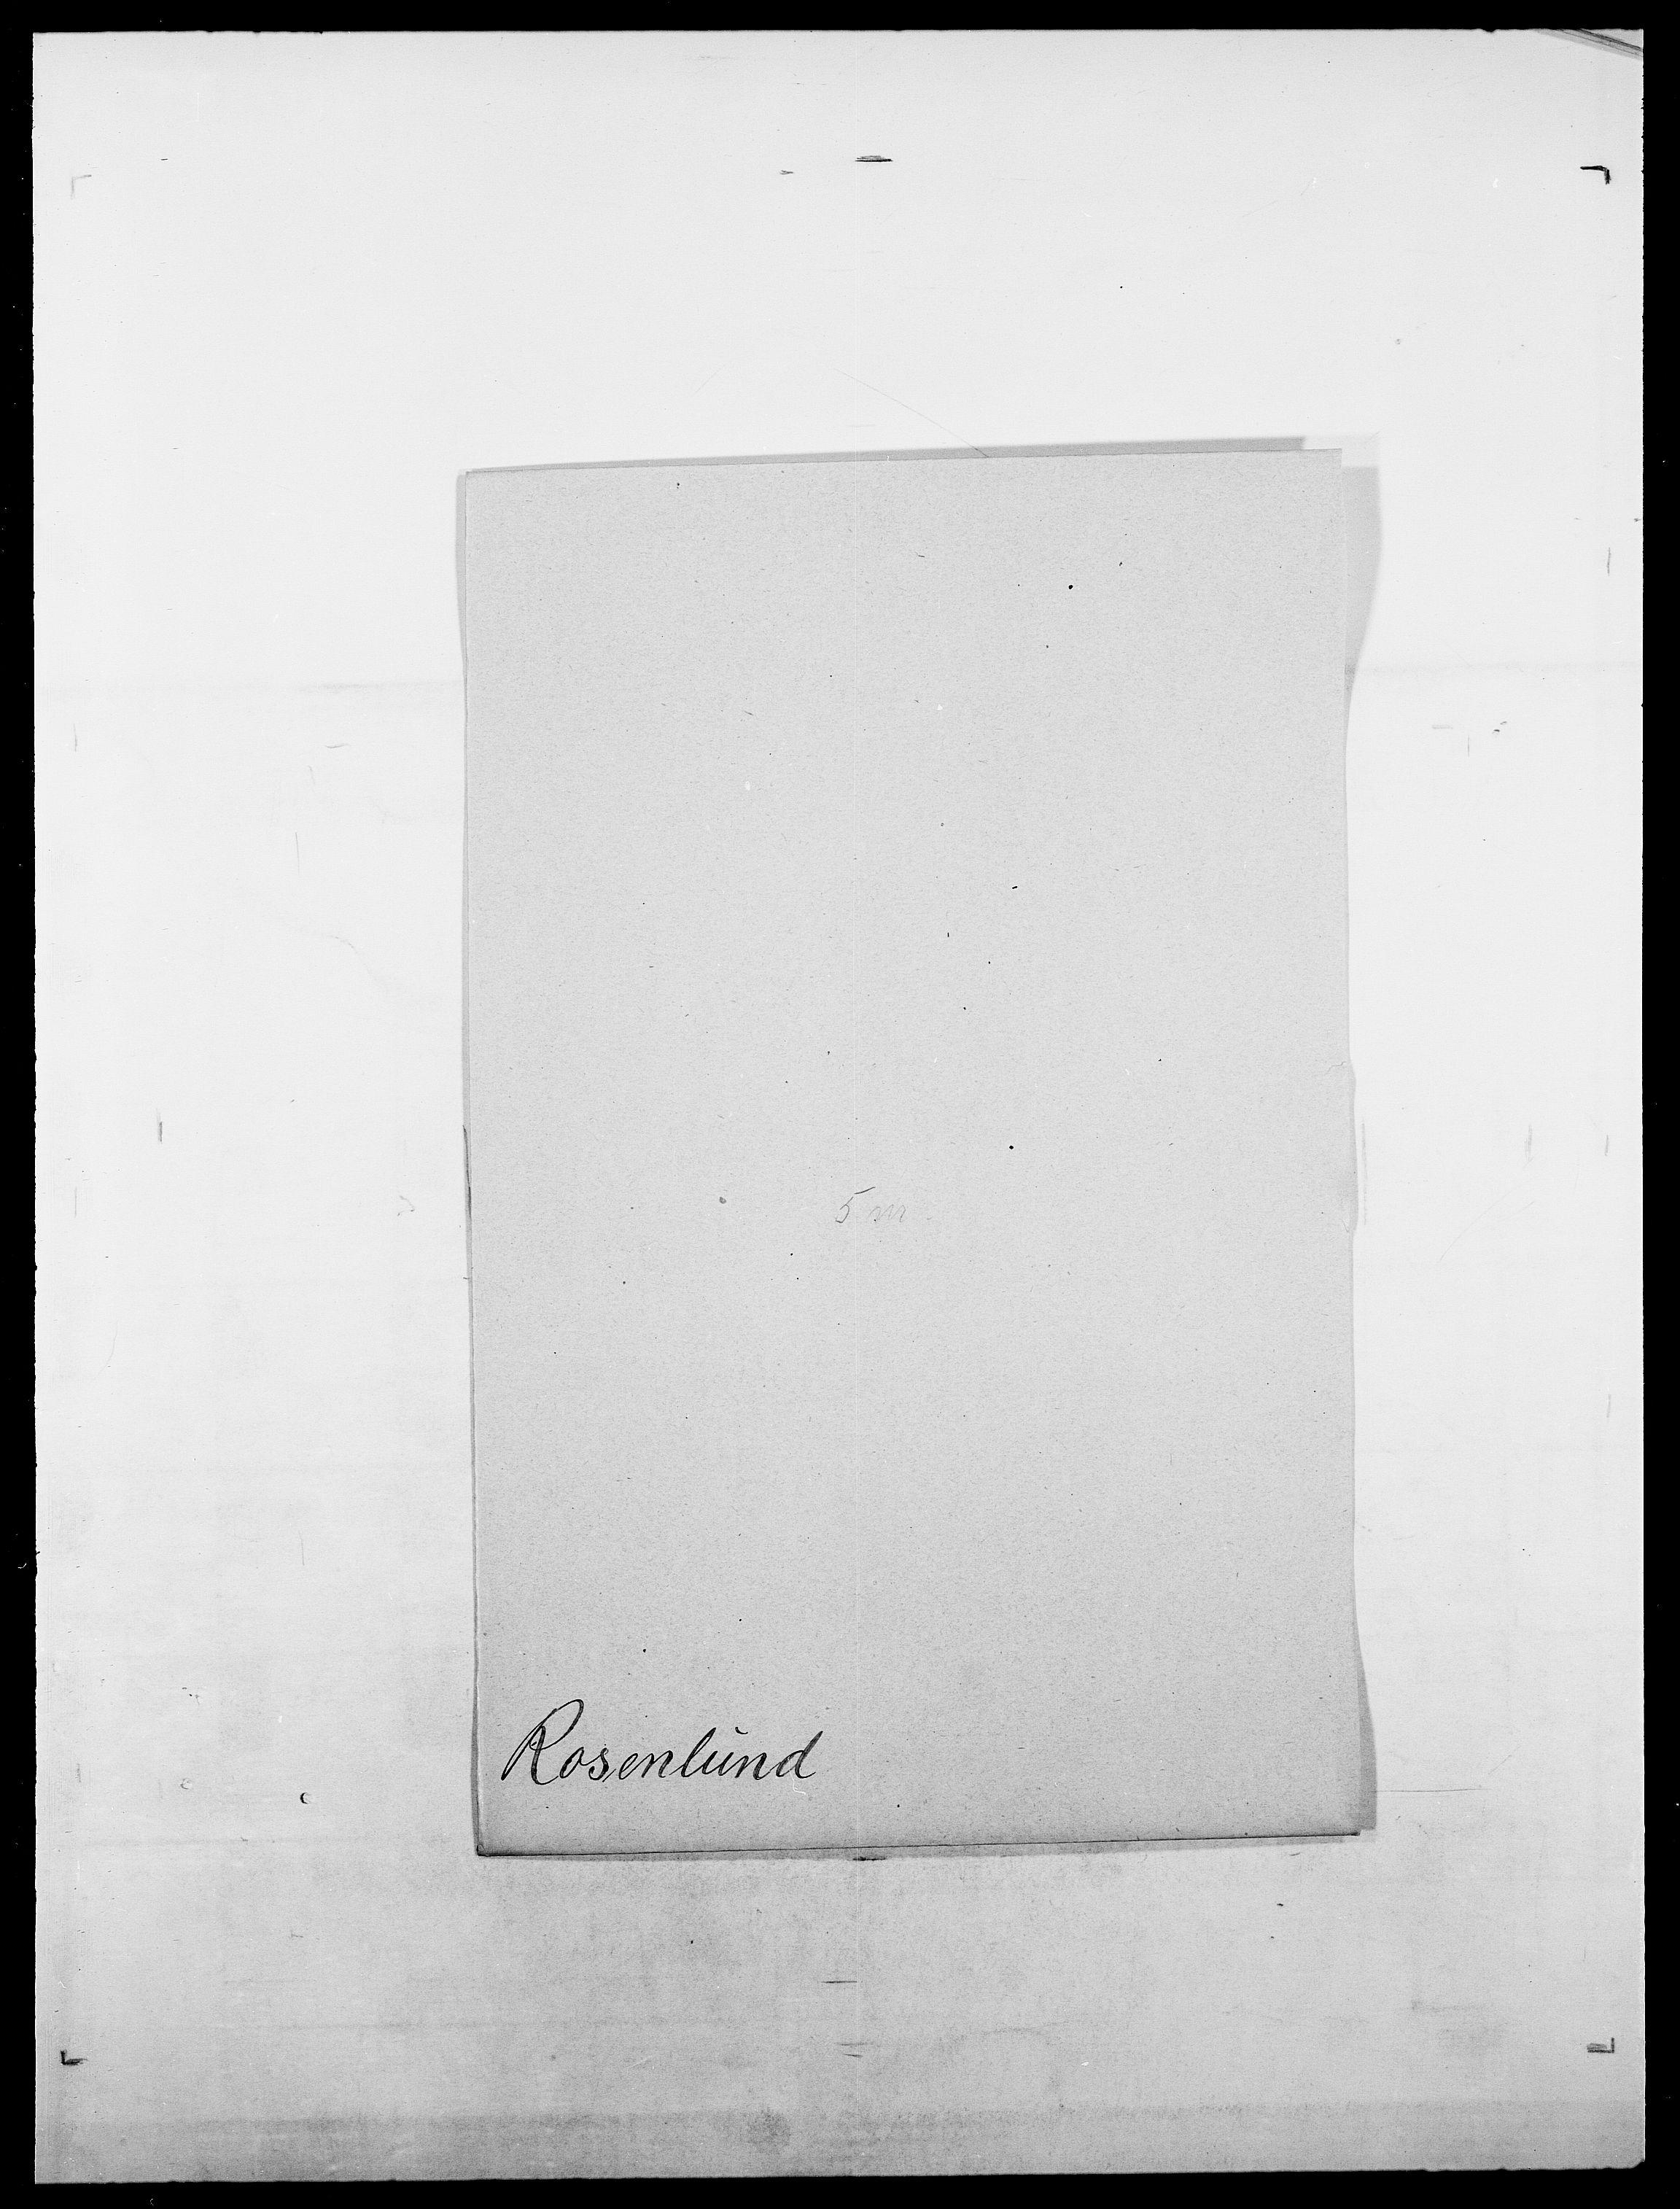 SAO, Delgobe, Charles Antoine - samling, D/Da/L0033: Roald - Røyem, s. 258